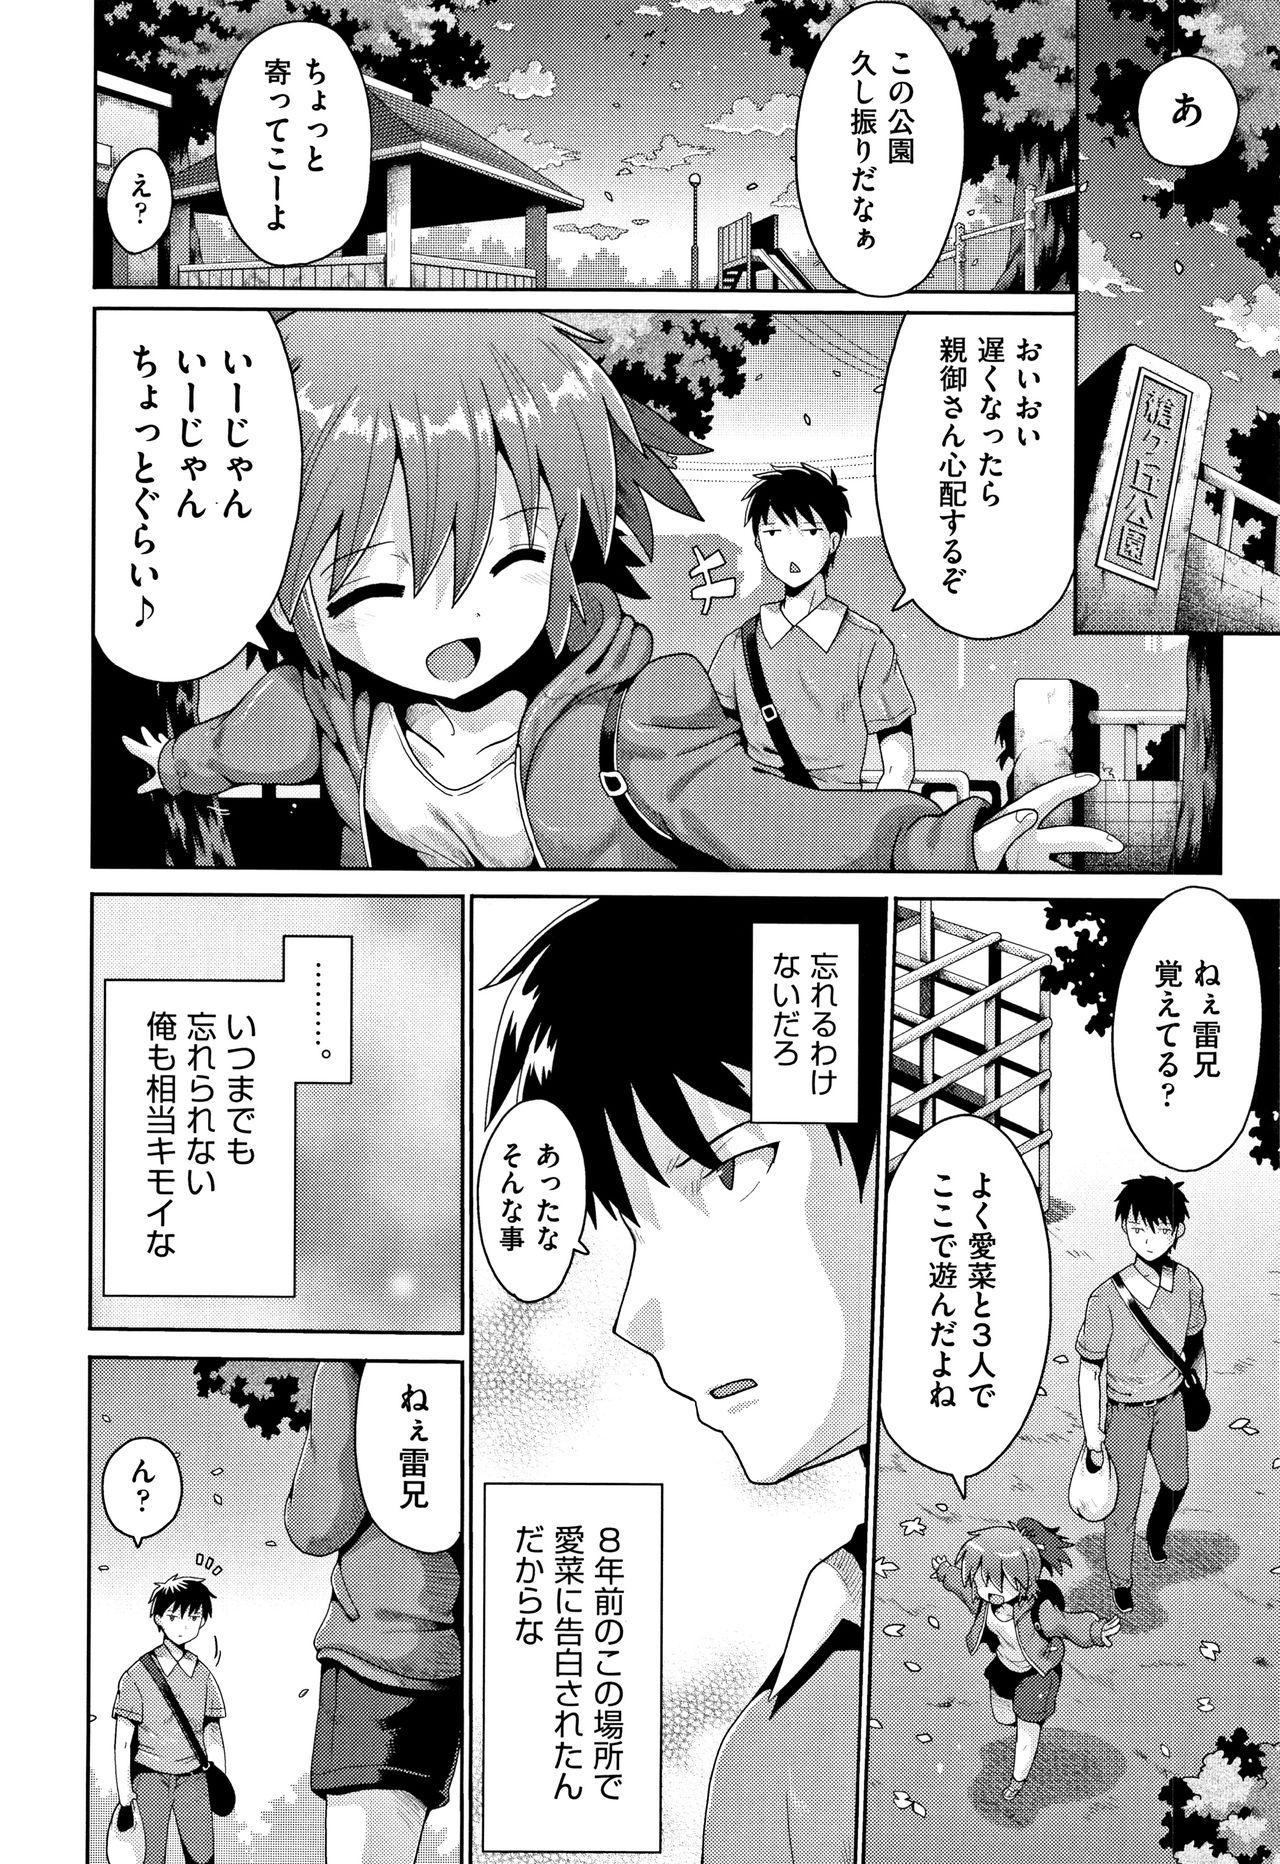 Kokugo Sansuu Rika Sex 12